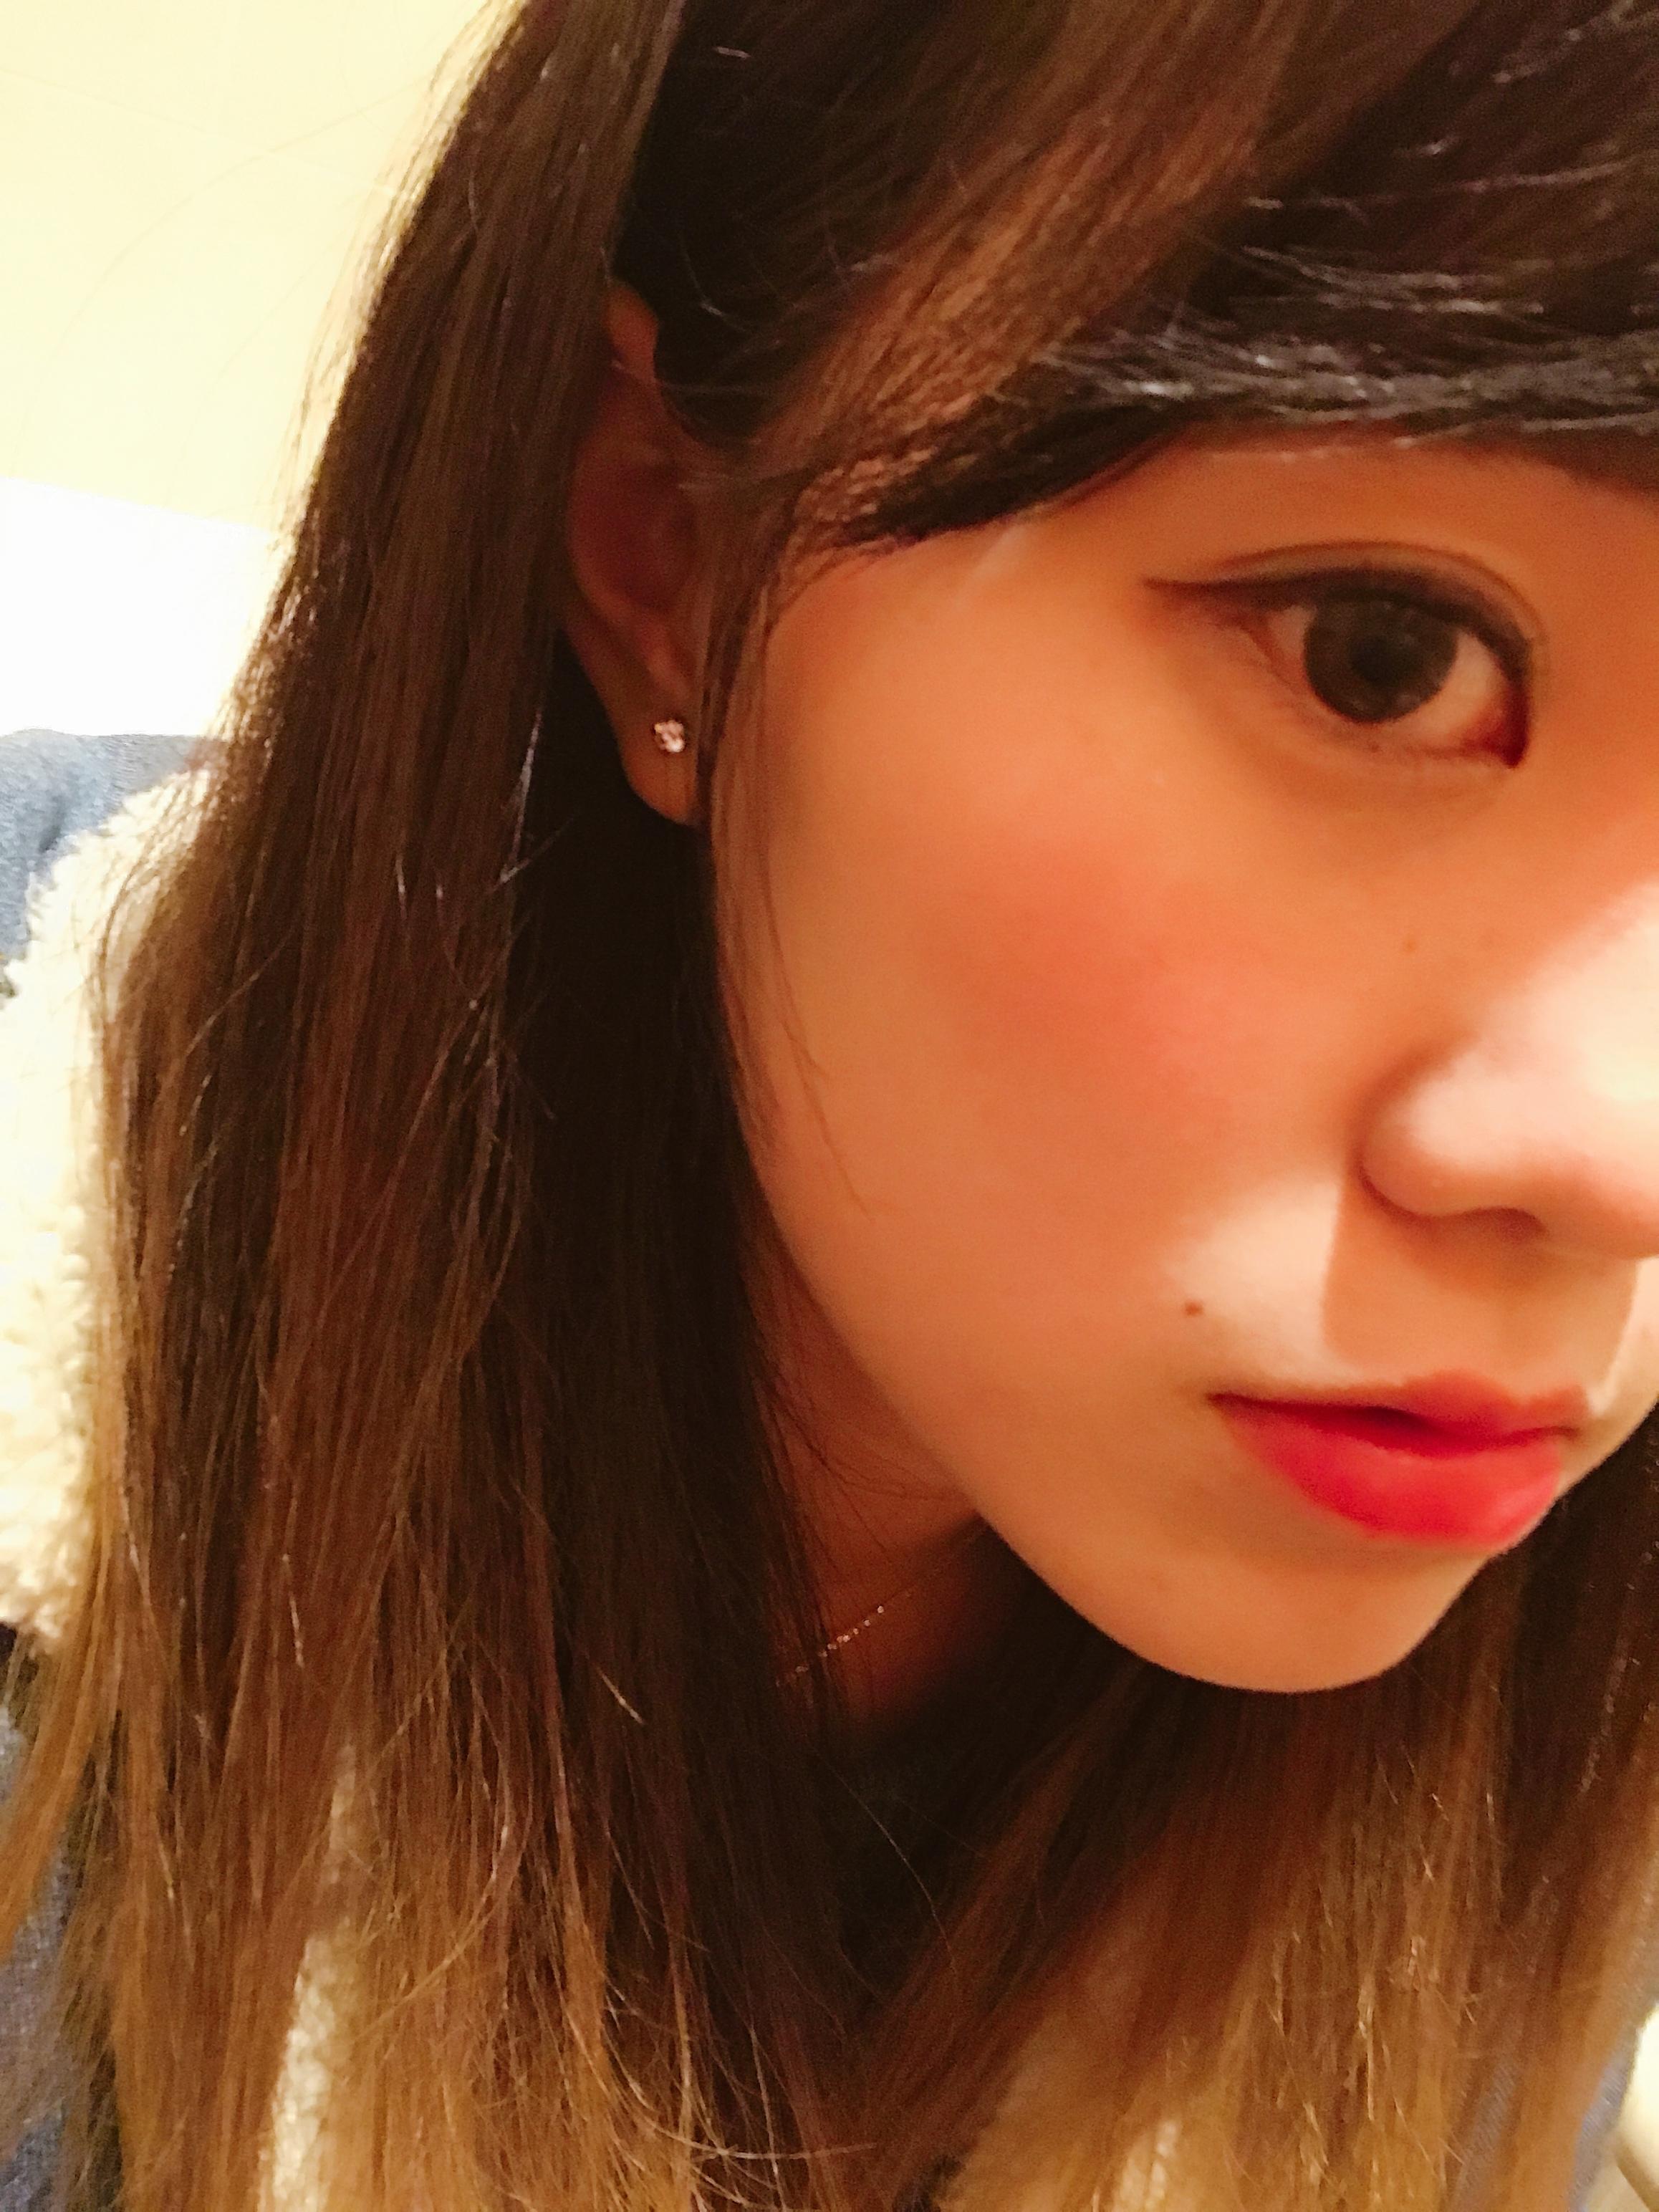 NaTSUNAxone - Japanese webcam girl